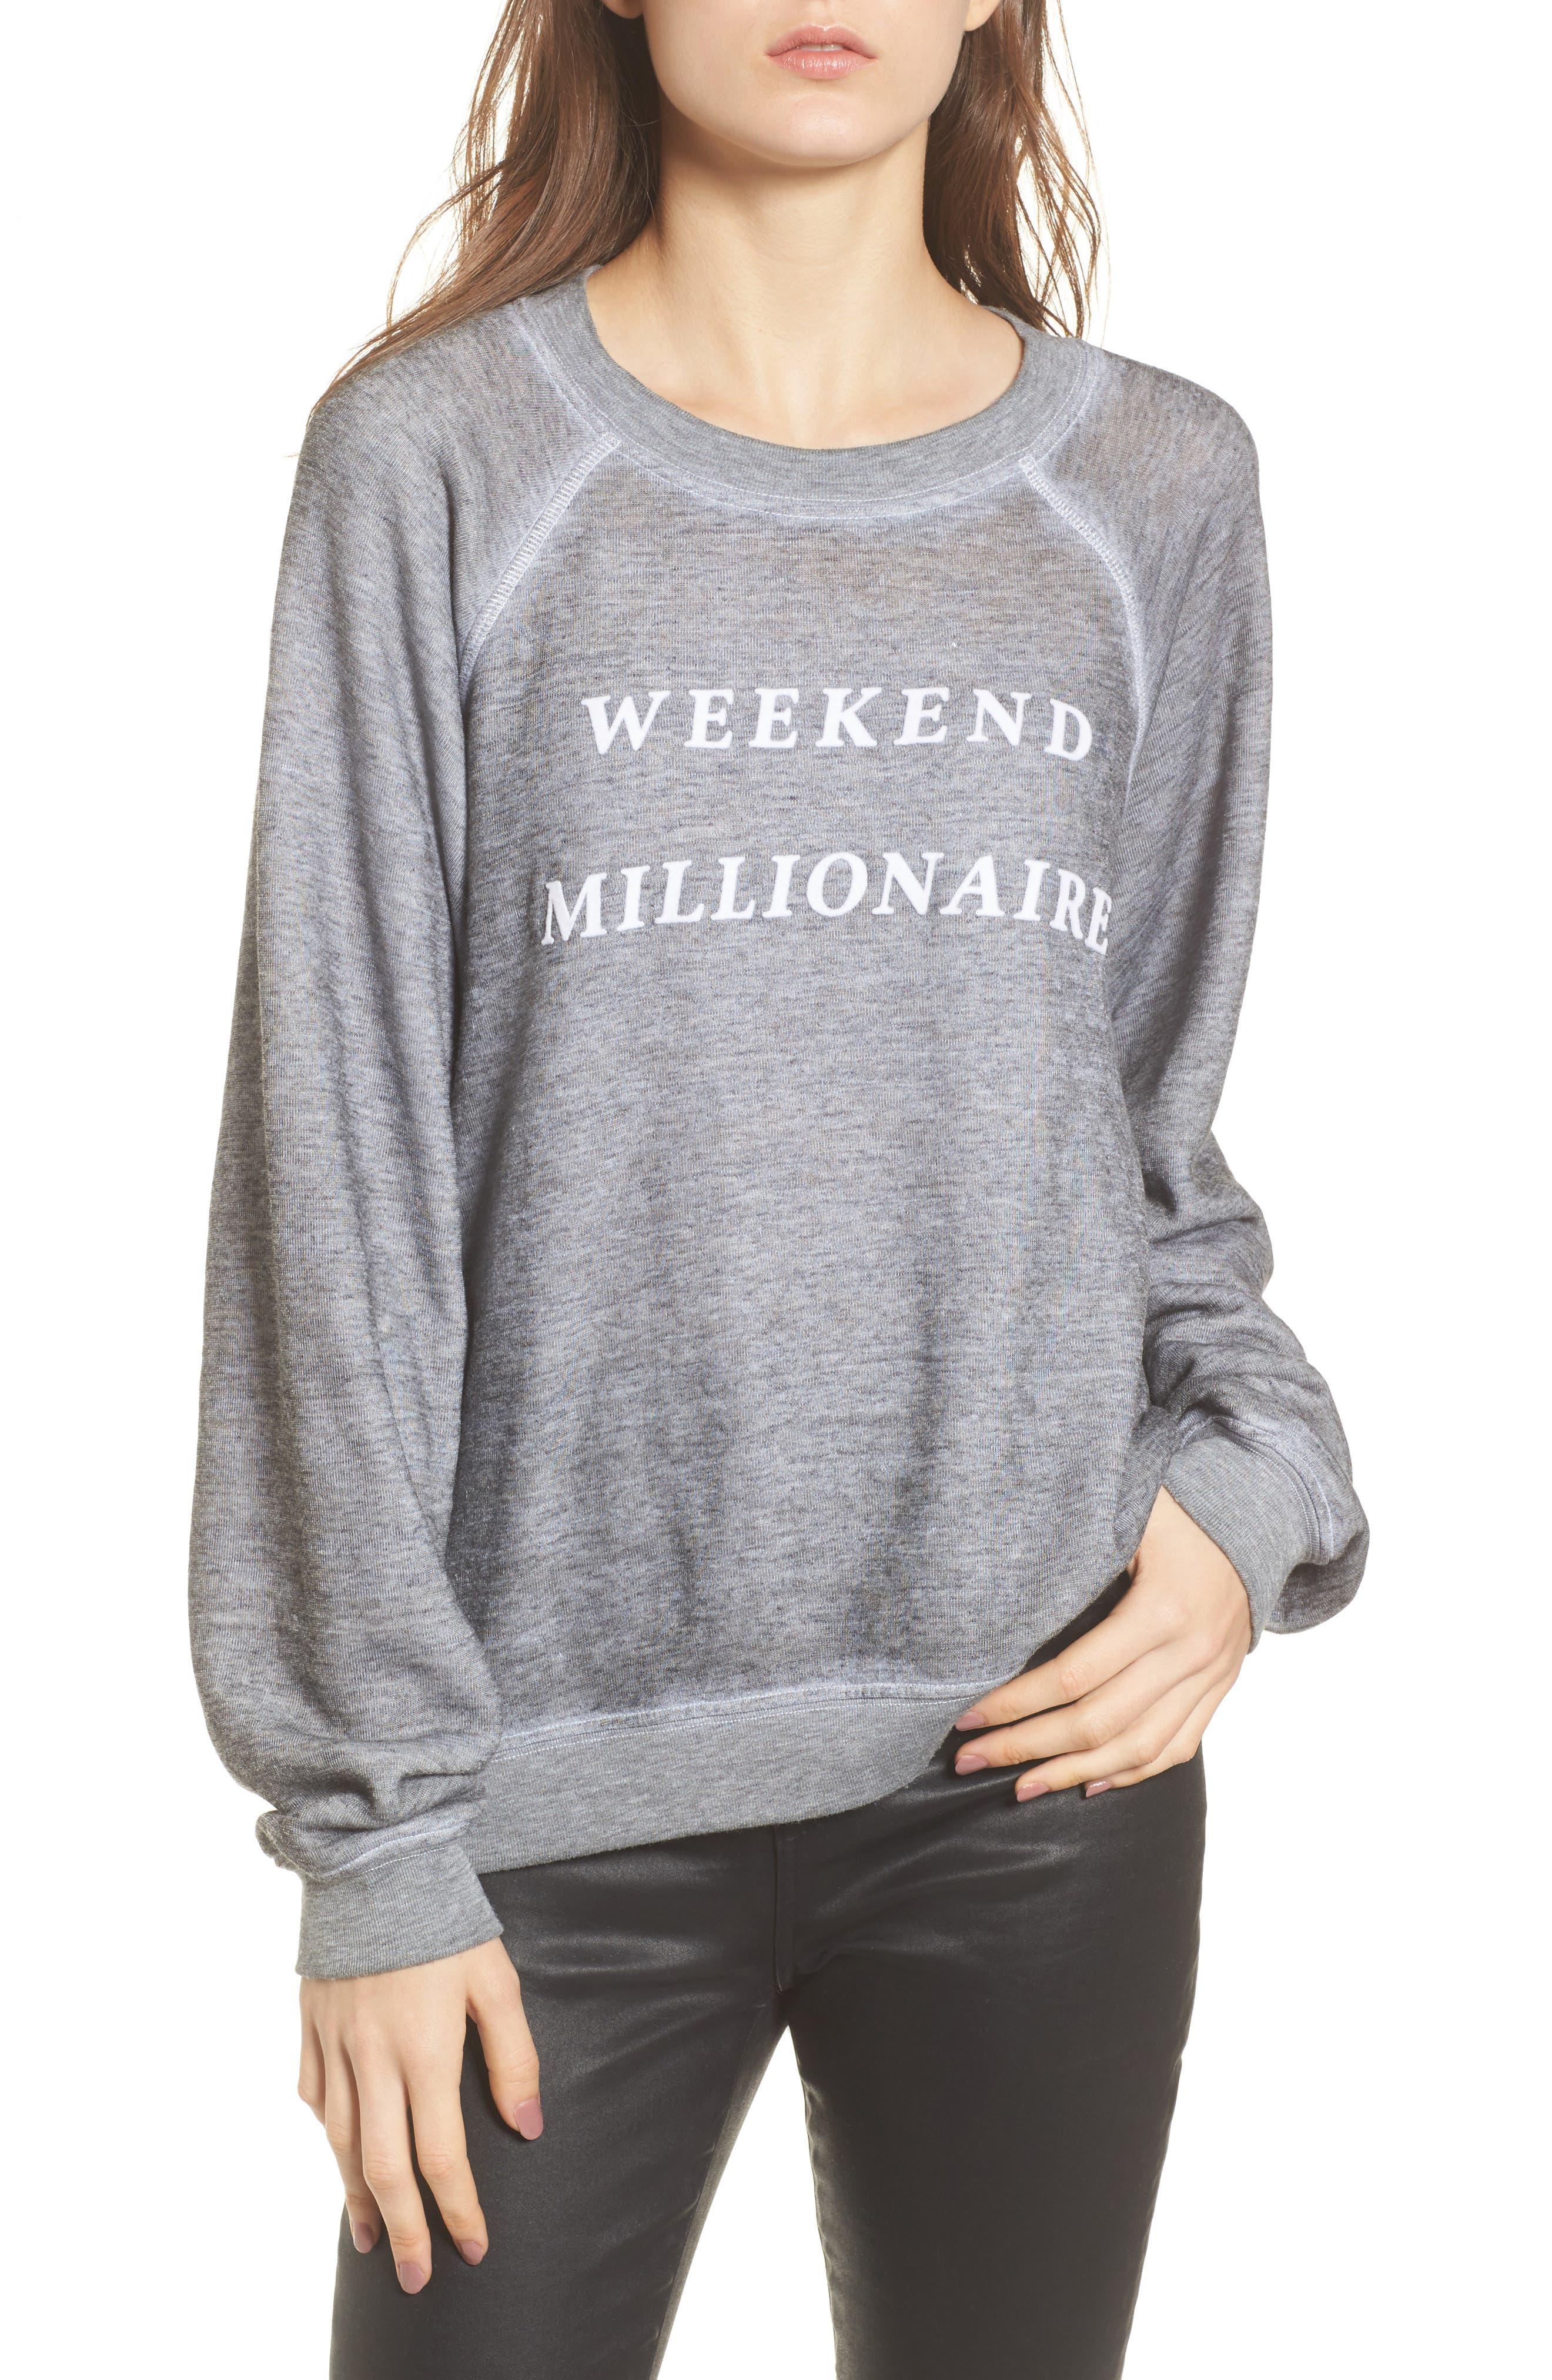 Weekend Millionaire Sweatshirt,                         Main,                         color, 020